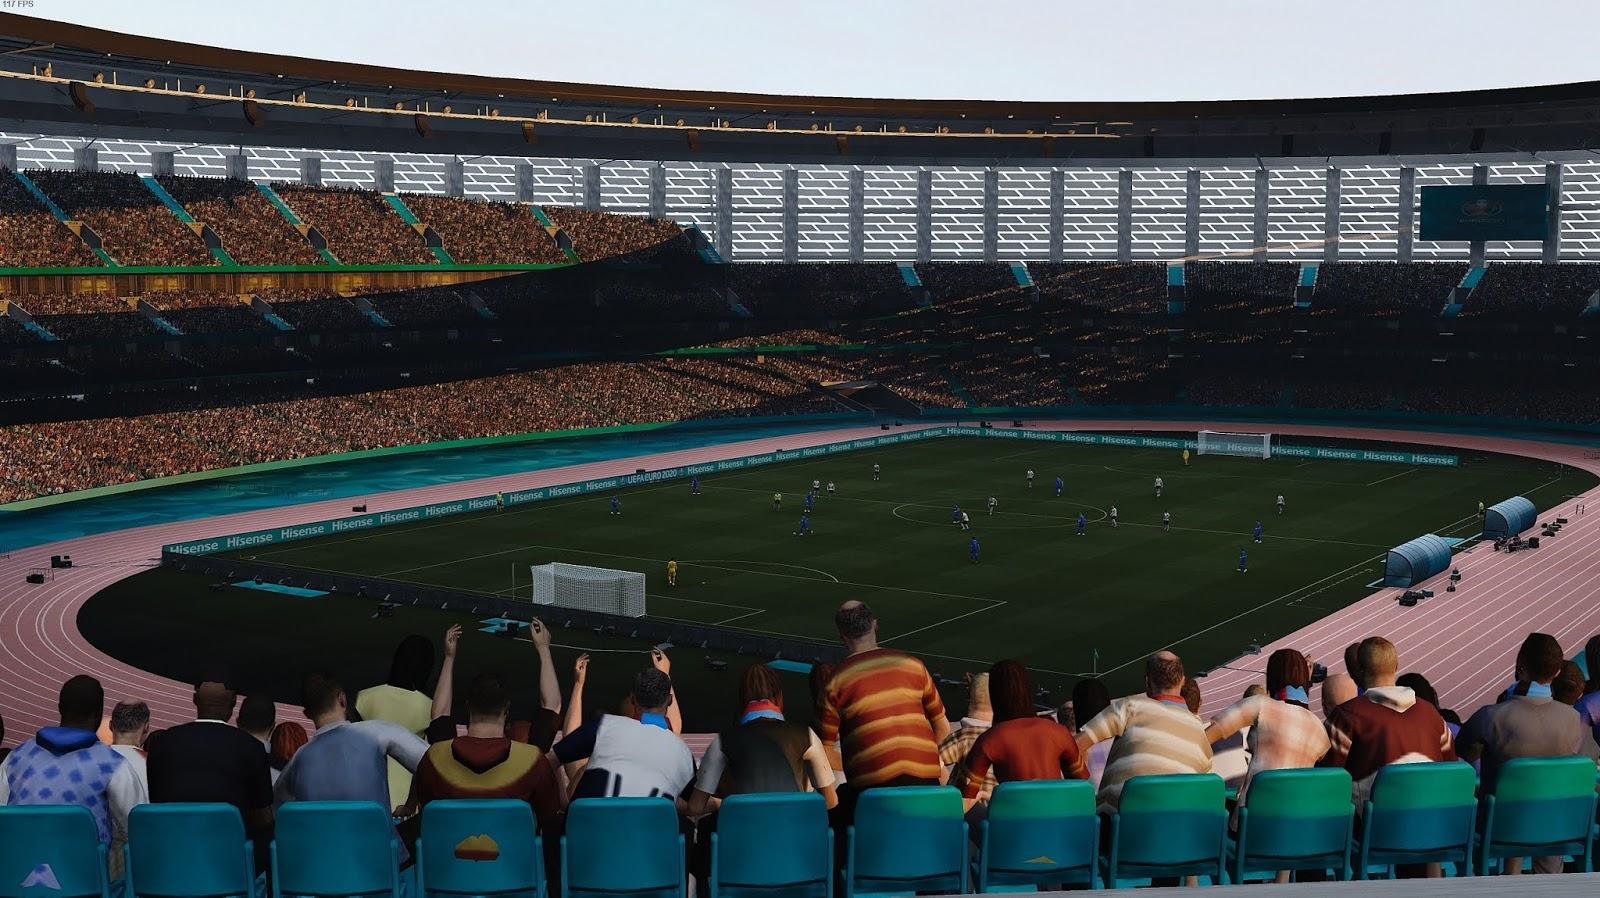 2020 EURO version Baku 2020 Stadium Olympic PES